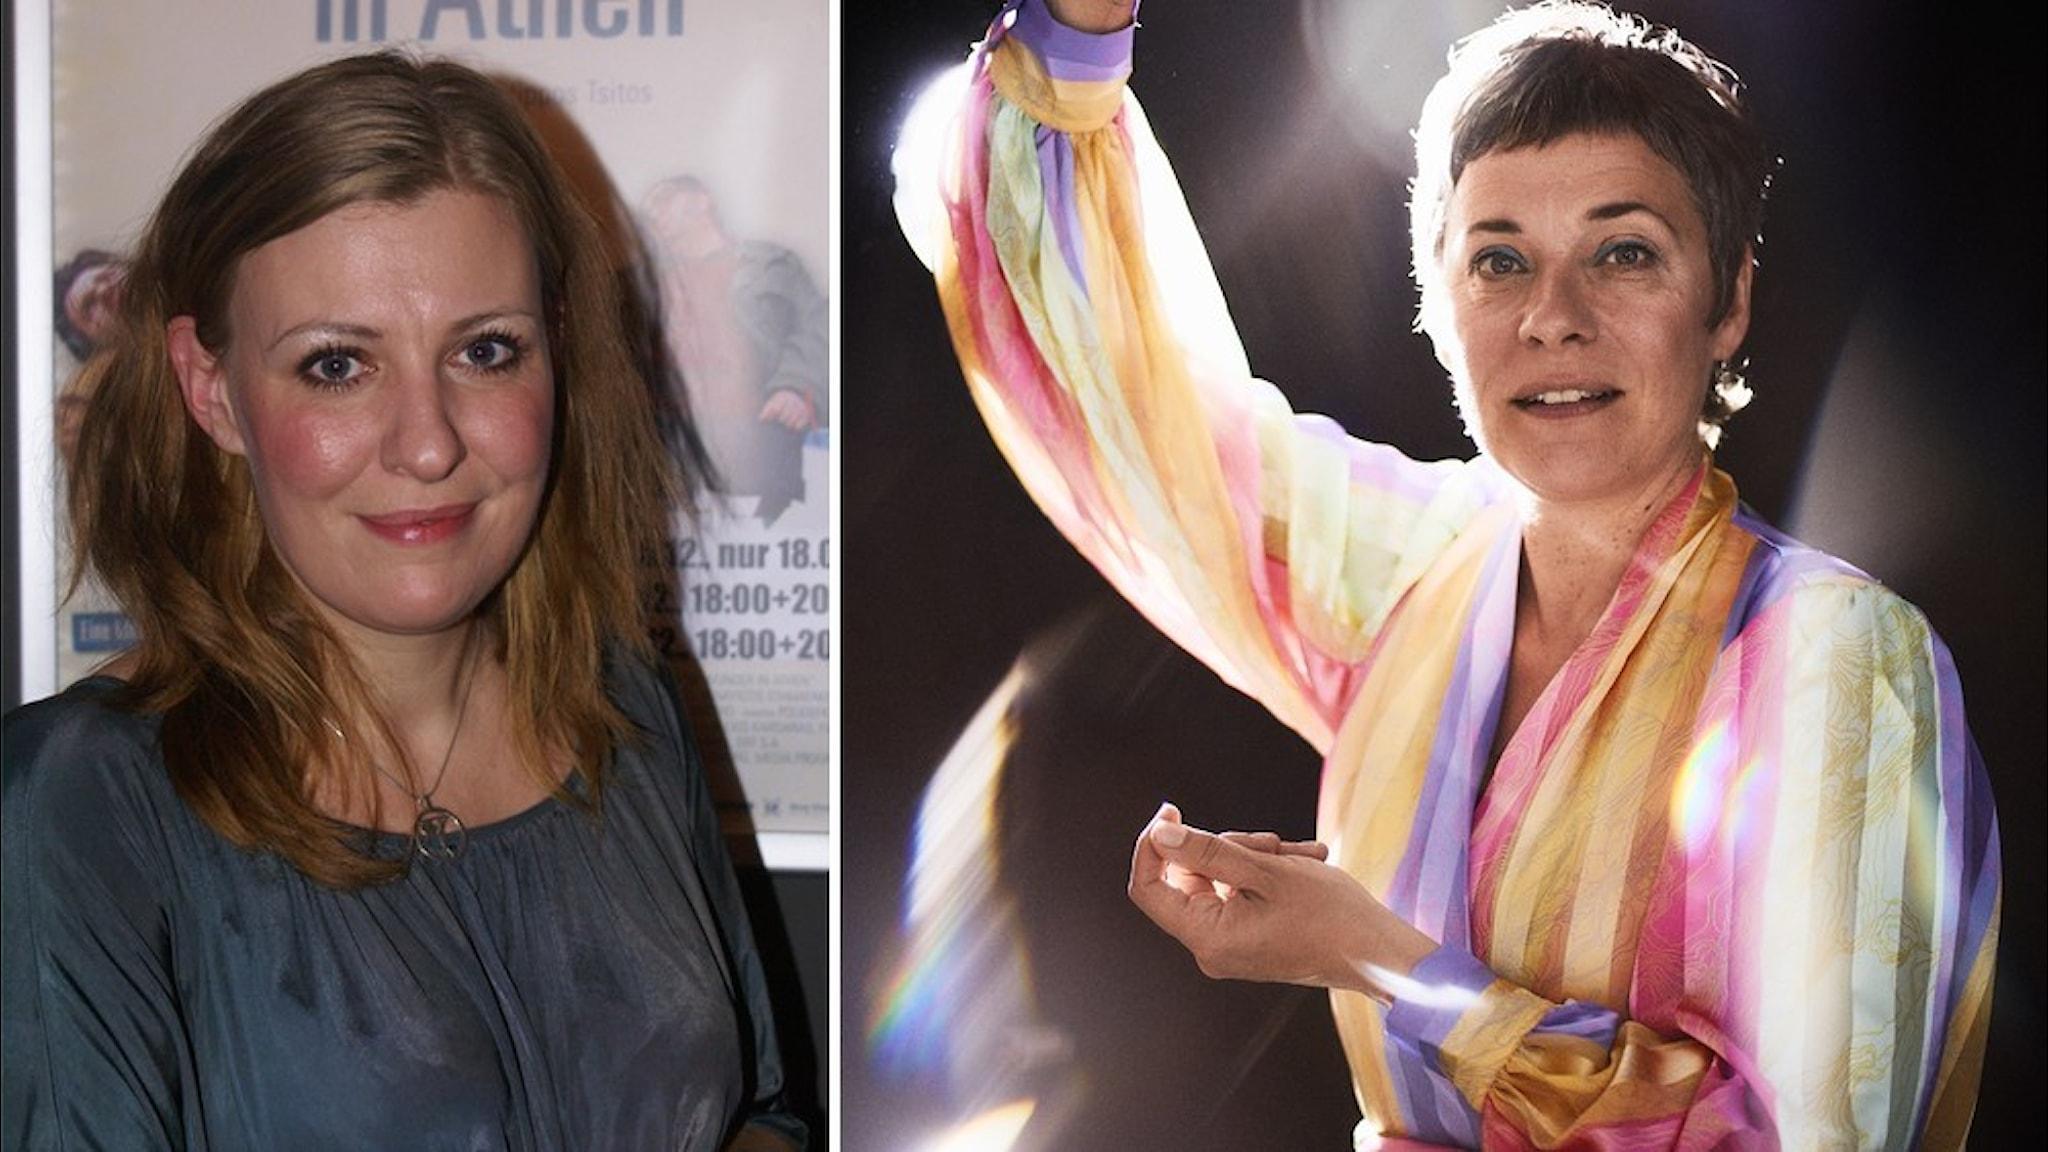 Jazzartisterna Ida Sand och Lina Nyberg.